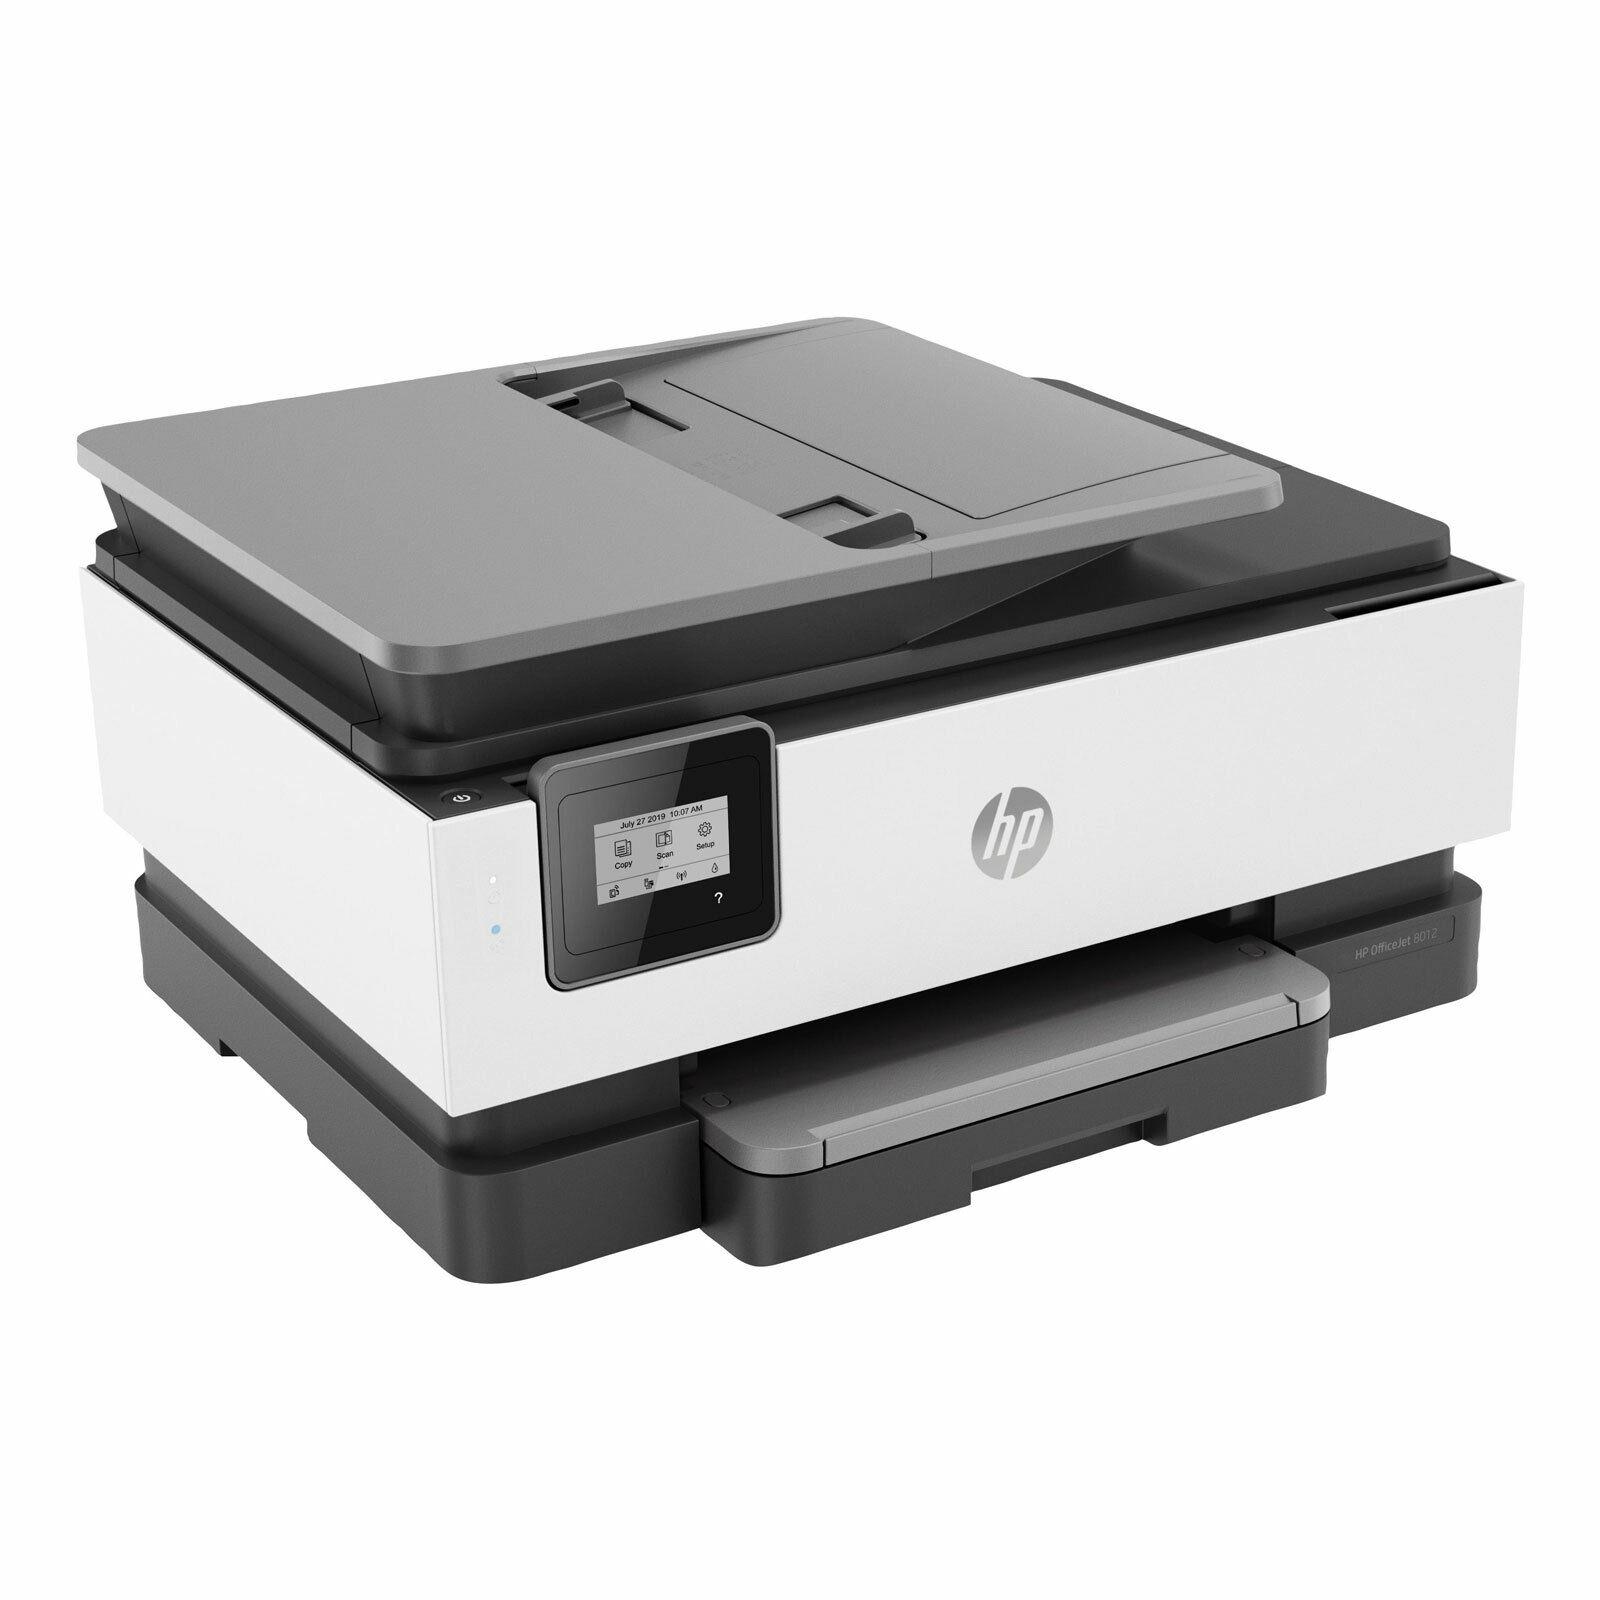 HP OfficeJet 8012 Multifunktionsdrucker WLAN Duplex Instant Ink Tintenstrahl